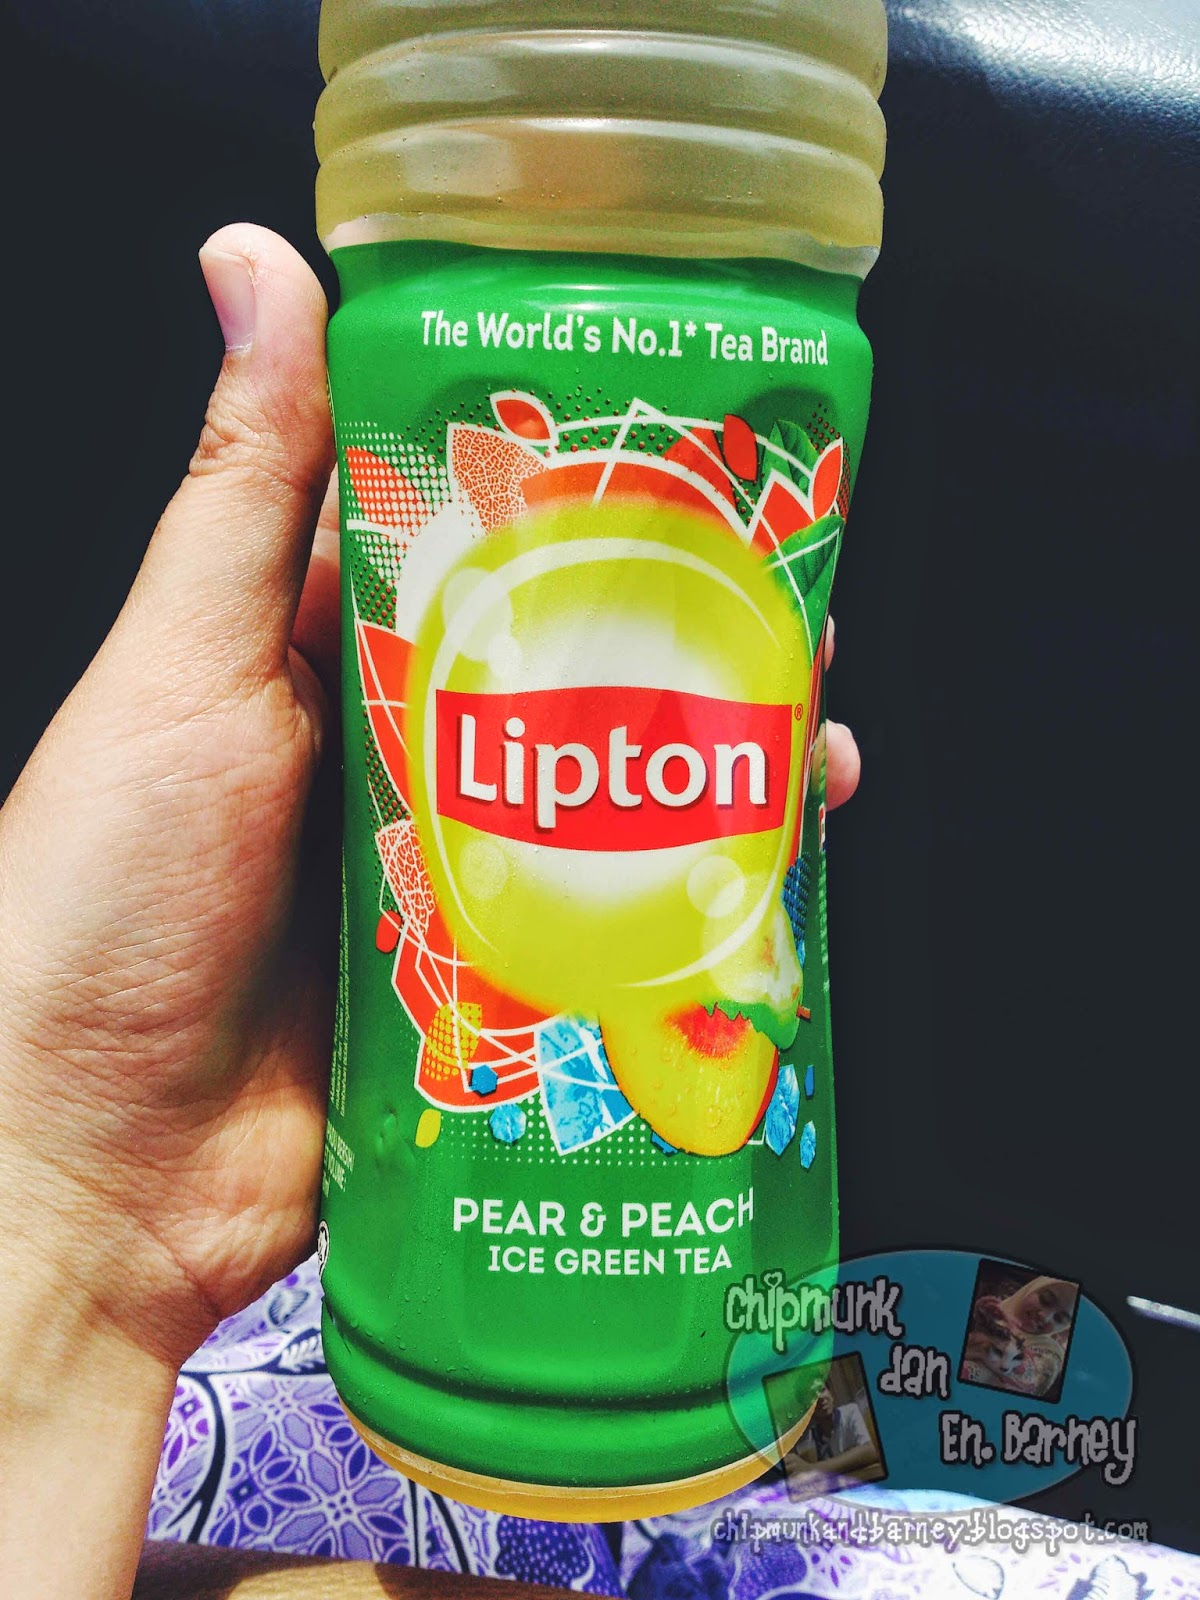 All About Life: Lipton Pear & Peach Ice Green Tea